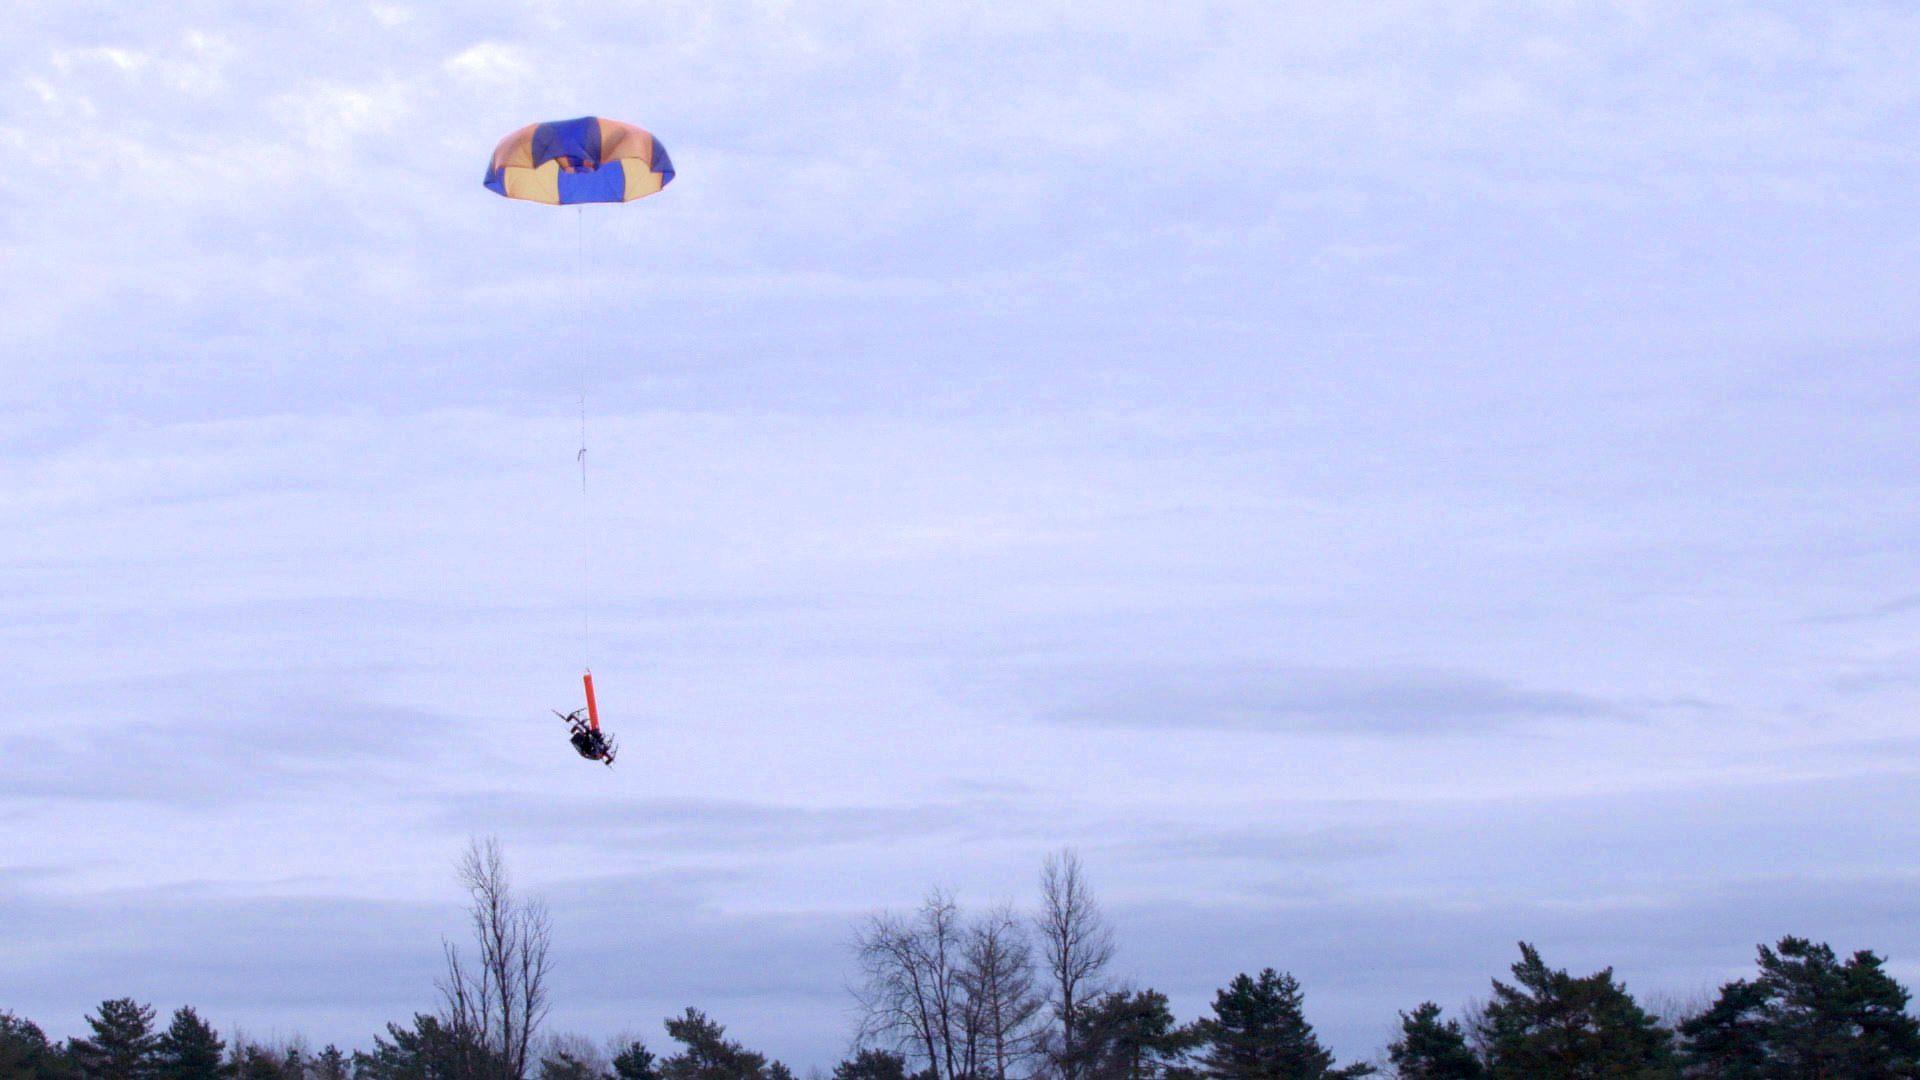 Indemnis Nexus Parachute for DJI drones meets stringent new safety standard